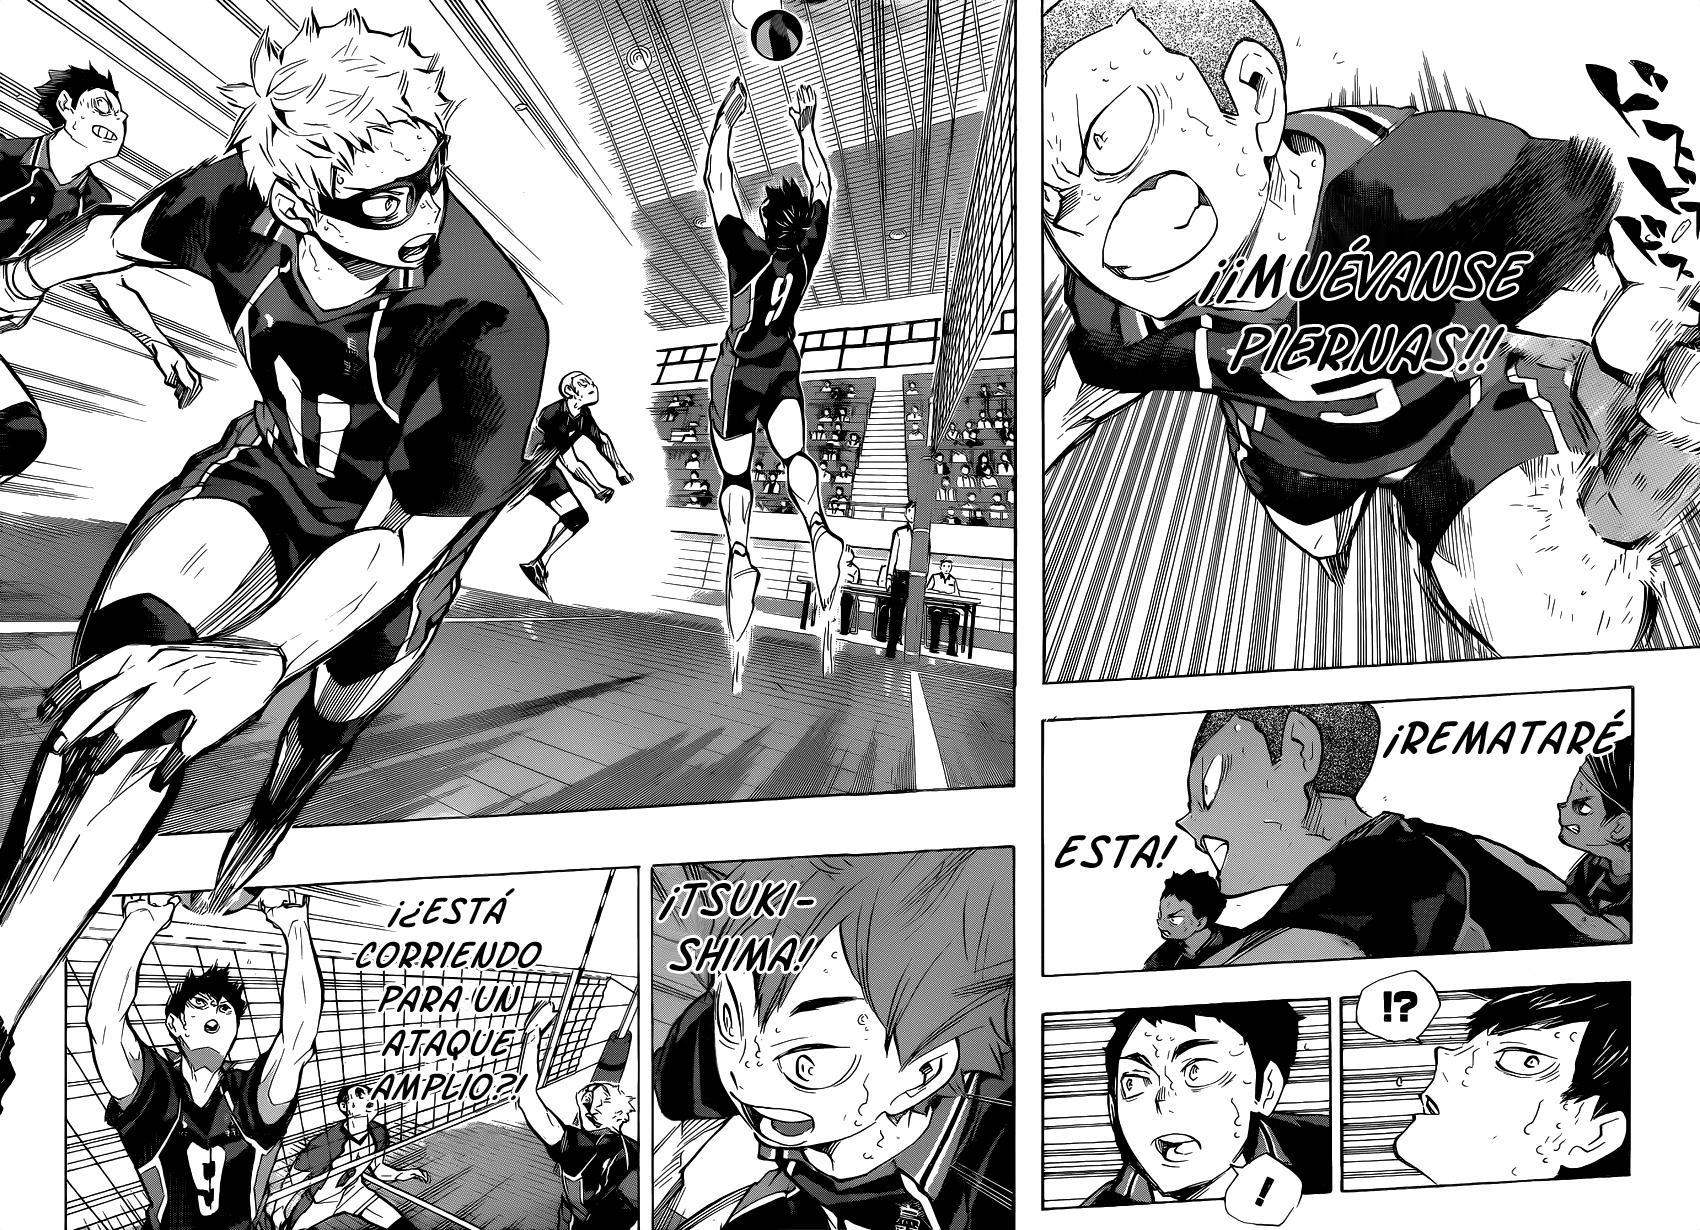 http://c5.ninemanga.com/es_manga/10/10/432478/b523f2328fd75b66f513b5dd6861706c.jpg Page 9